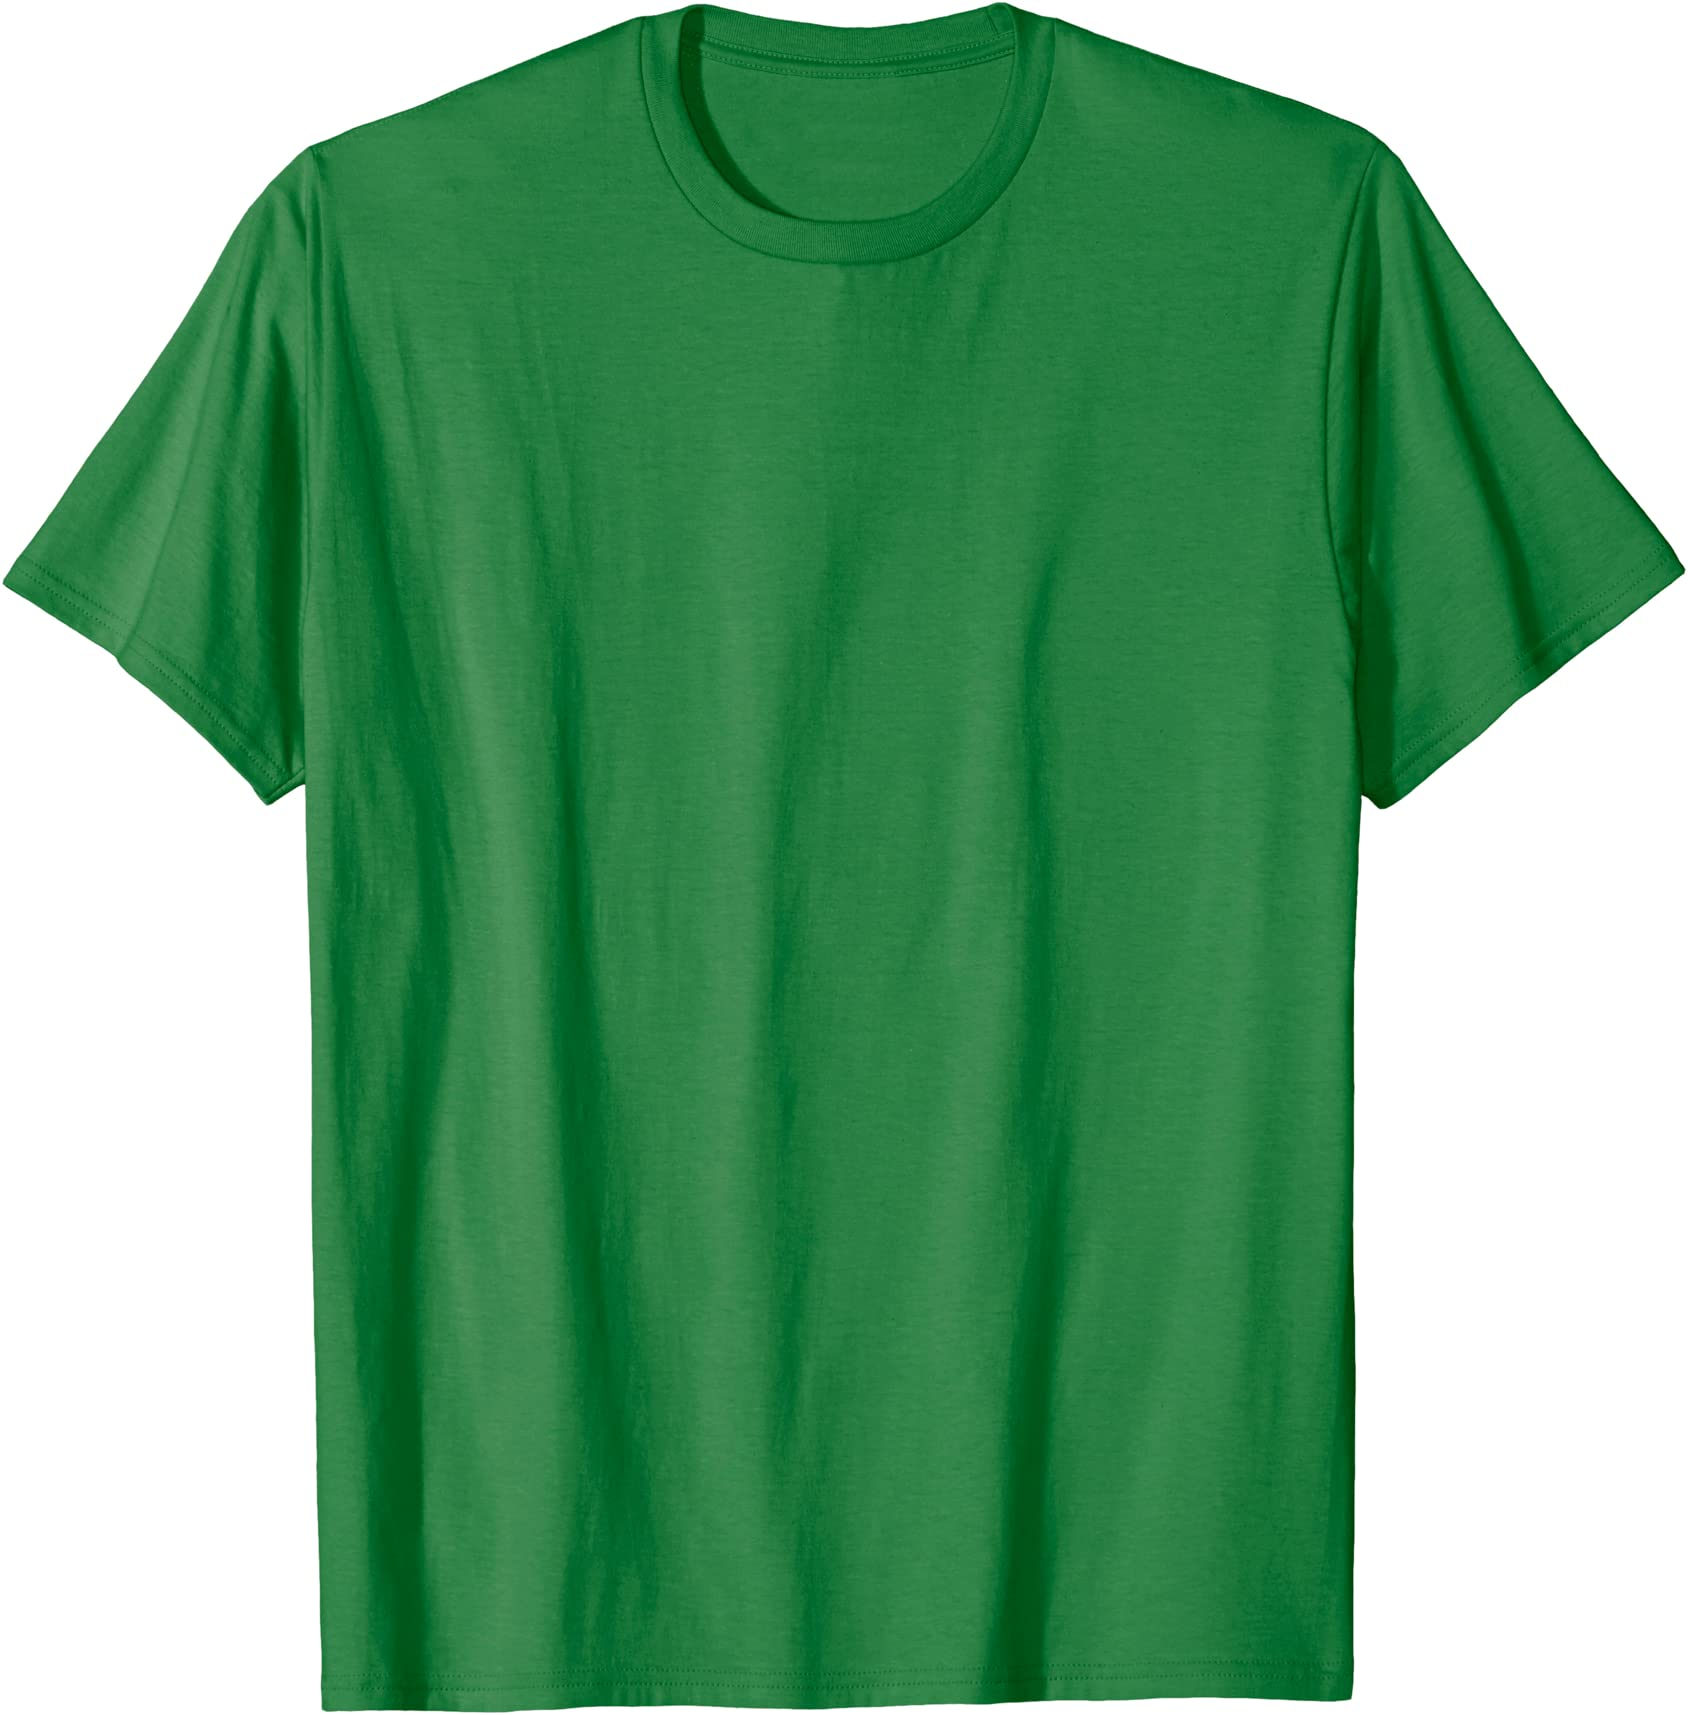 A Christmas Story You/'ll Shoot Ralphie Womens Green T-Shirt